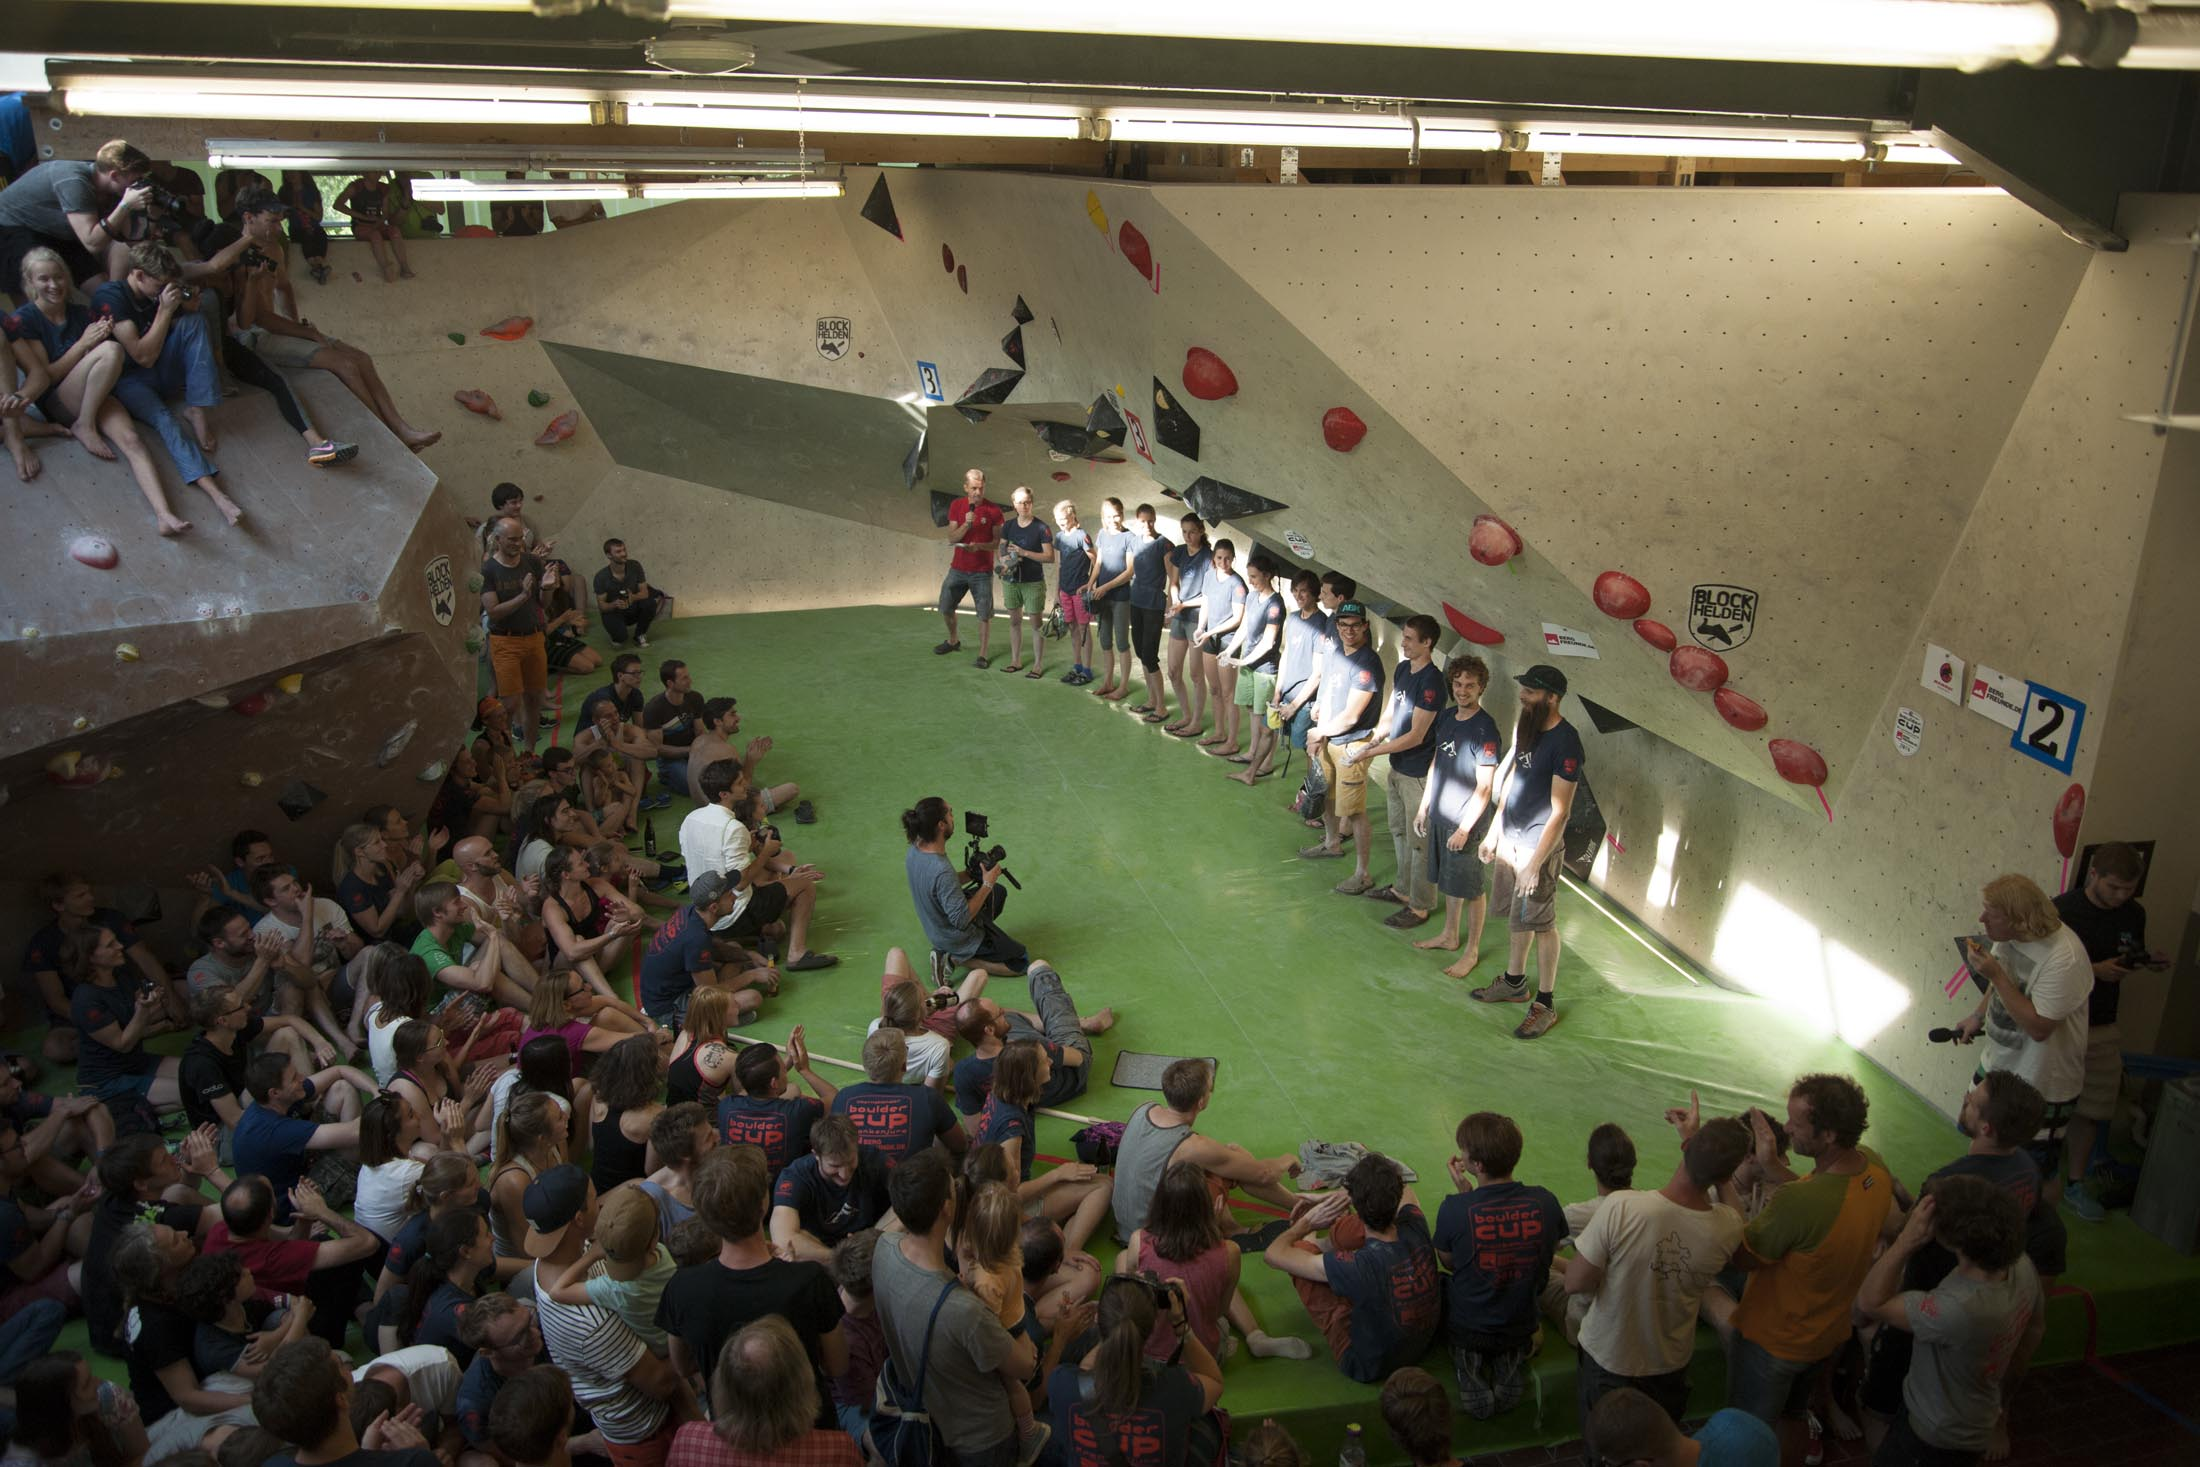 Finale, internationaler bouldercup Frankenjura 2016, BLOCKHELDEN Erlangen, Mammut, Bergfreunde.de, Boulderwettkampf07092016449